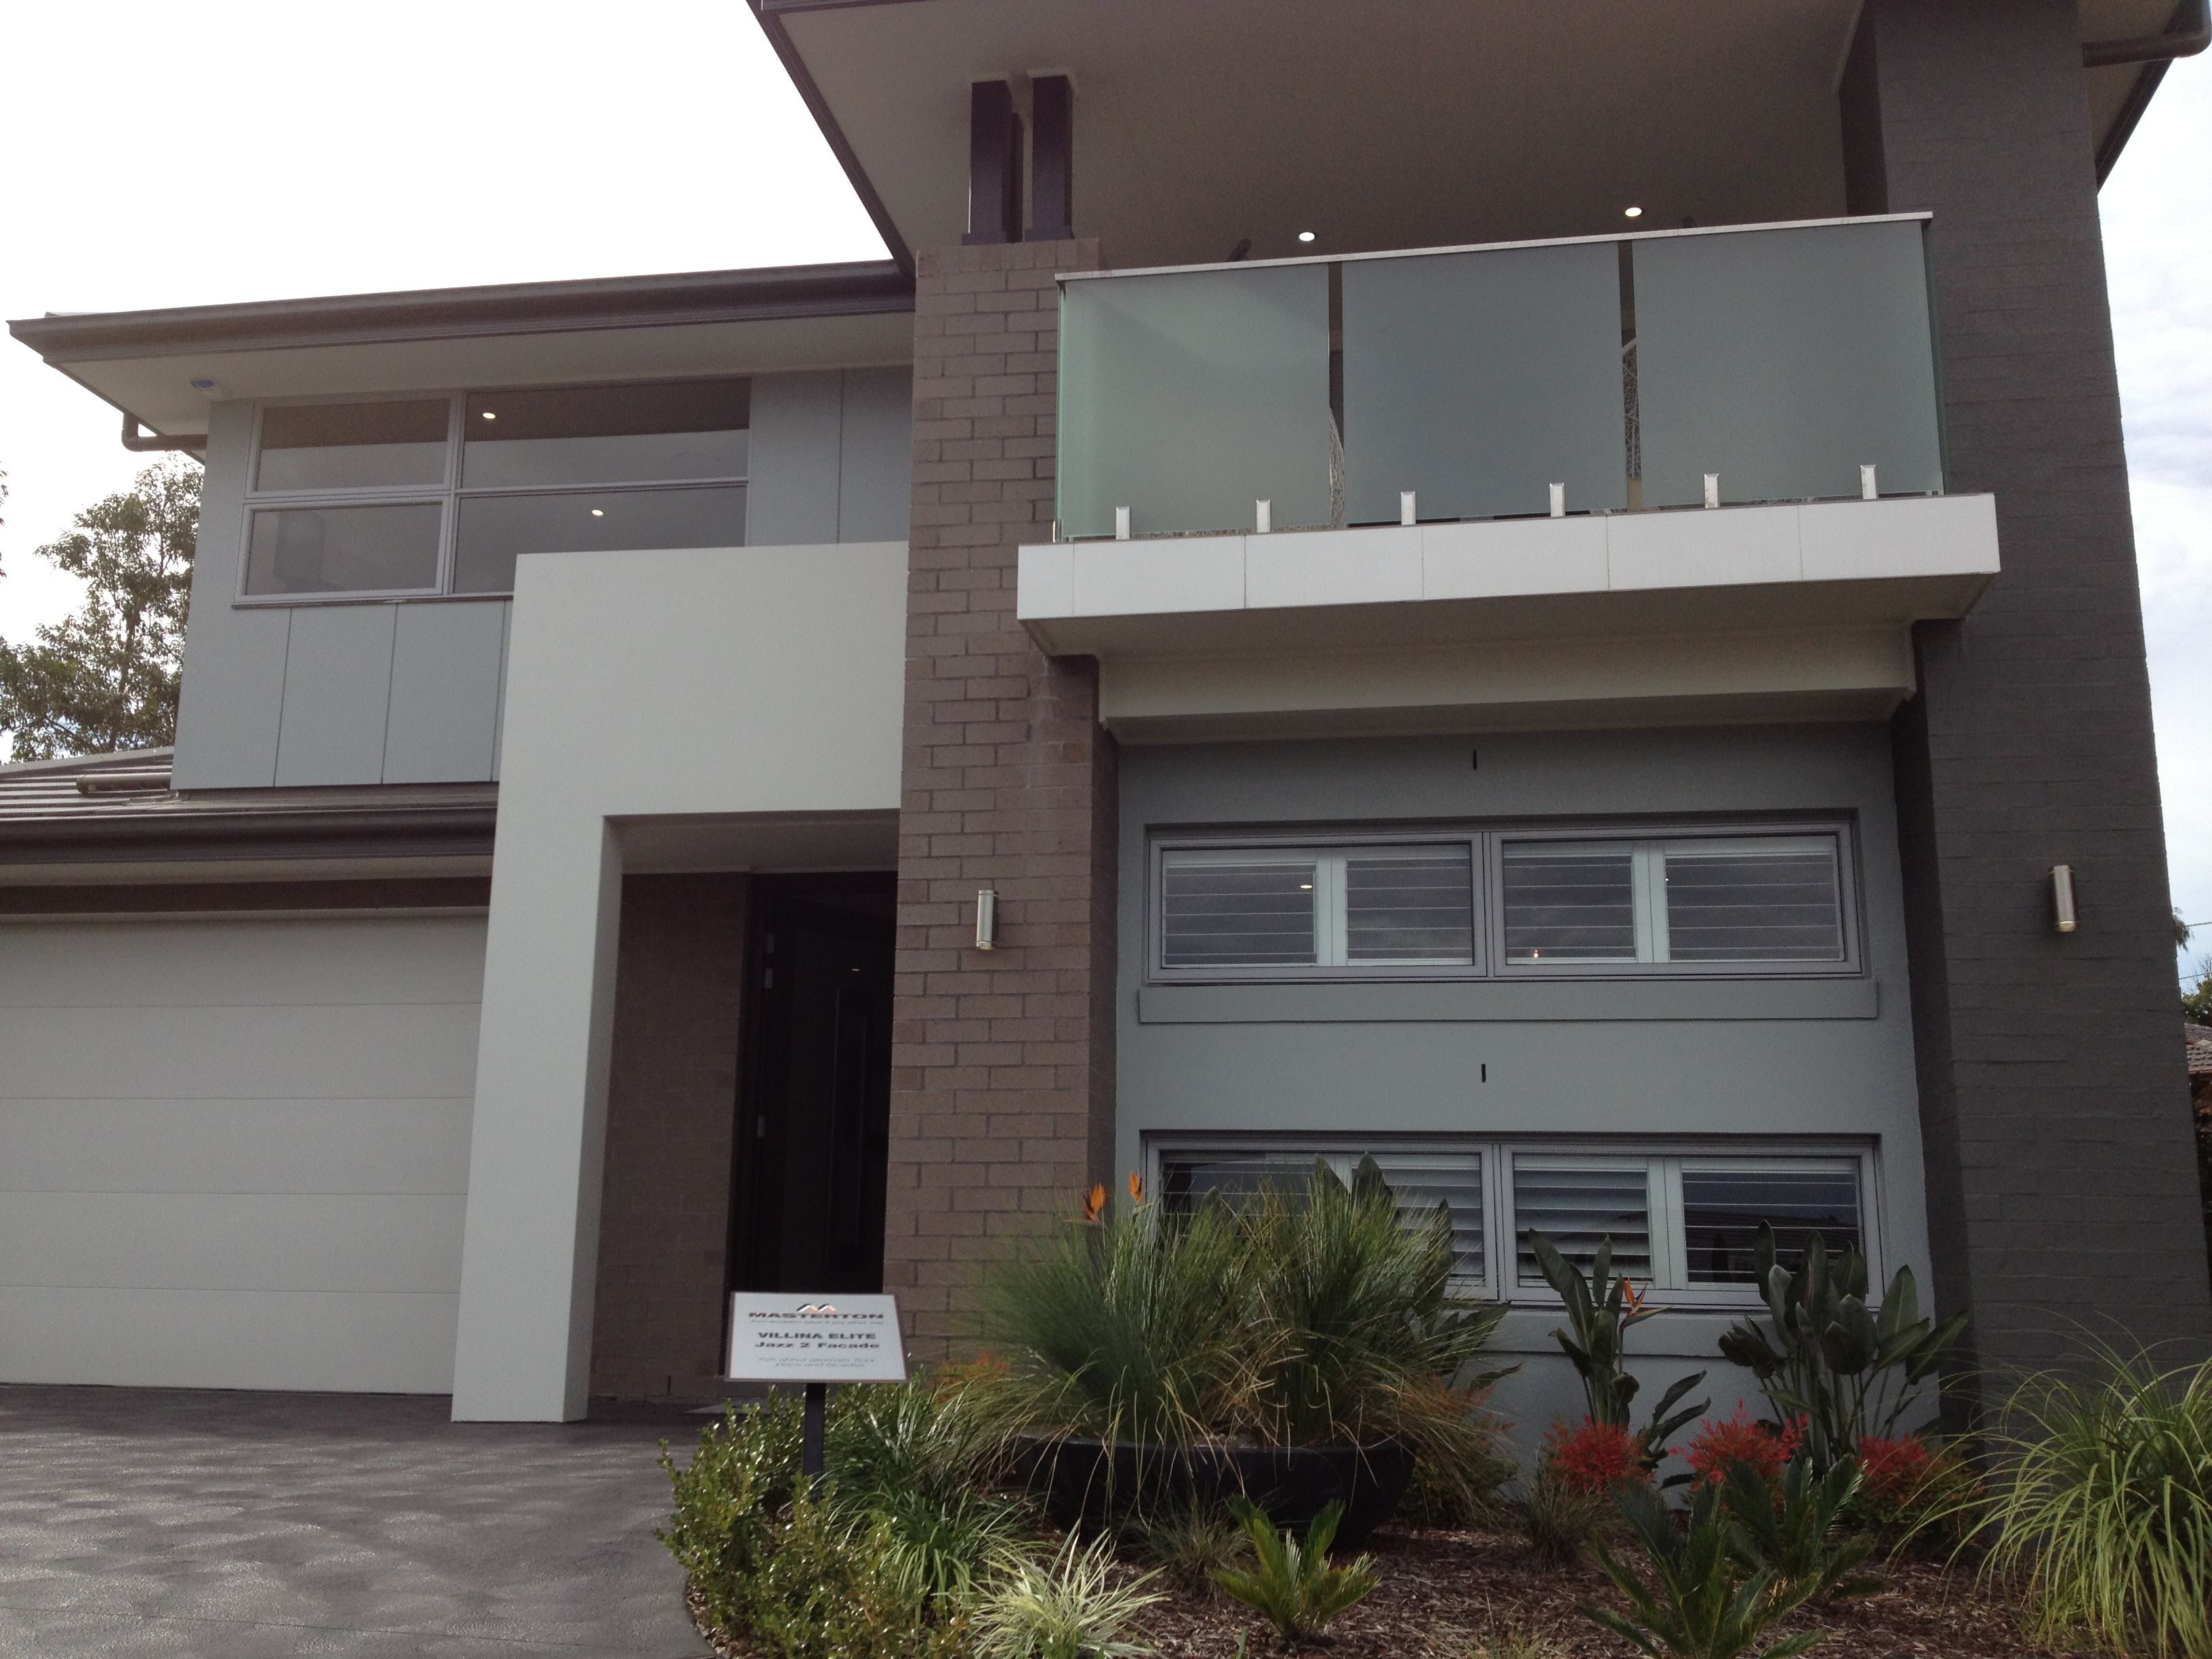 Masterton homes villina elite jazz 2 faced home designs for Home designs masterton